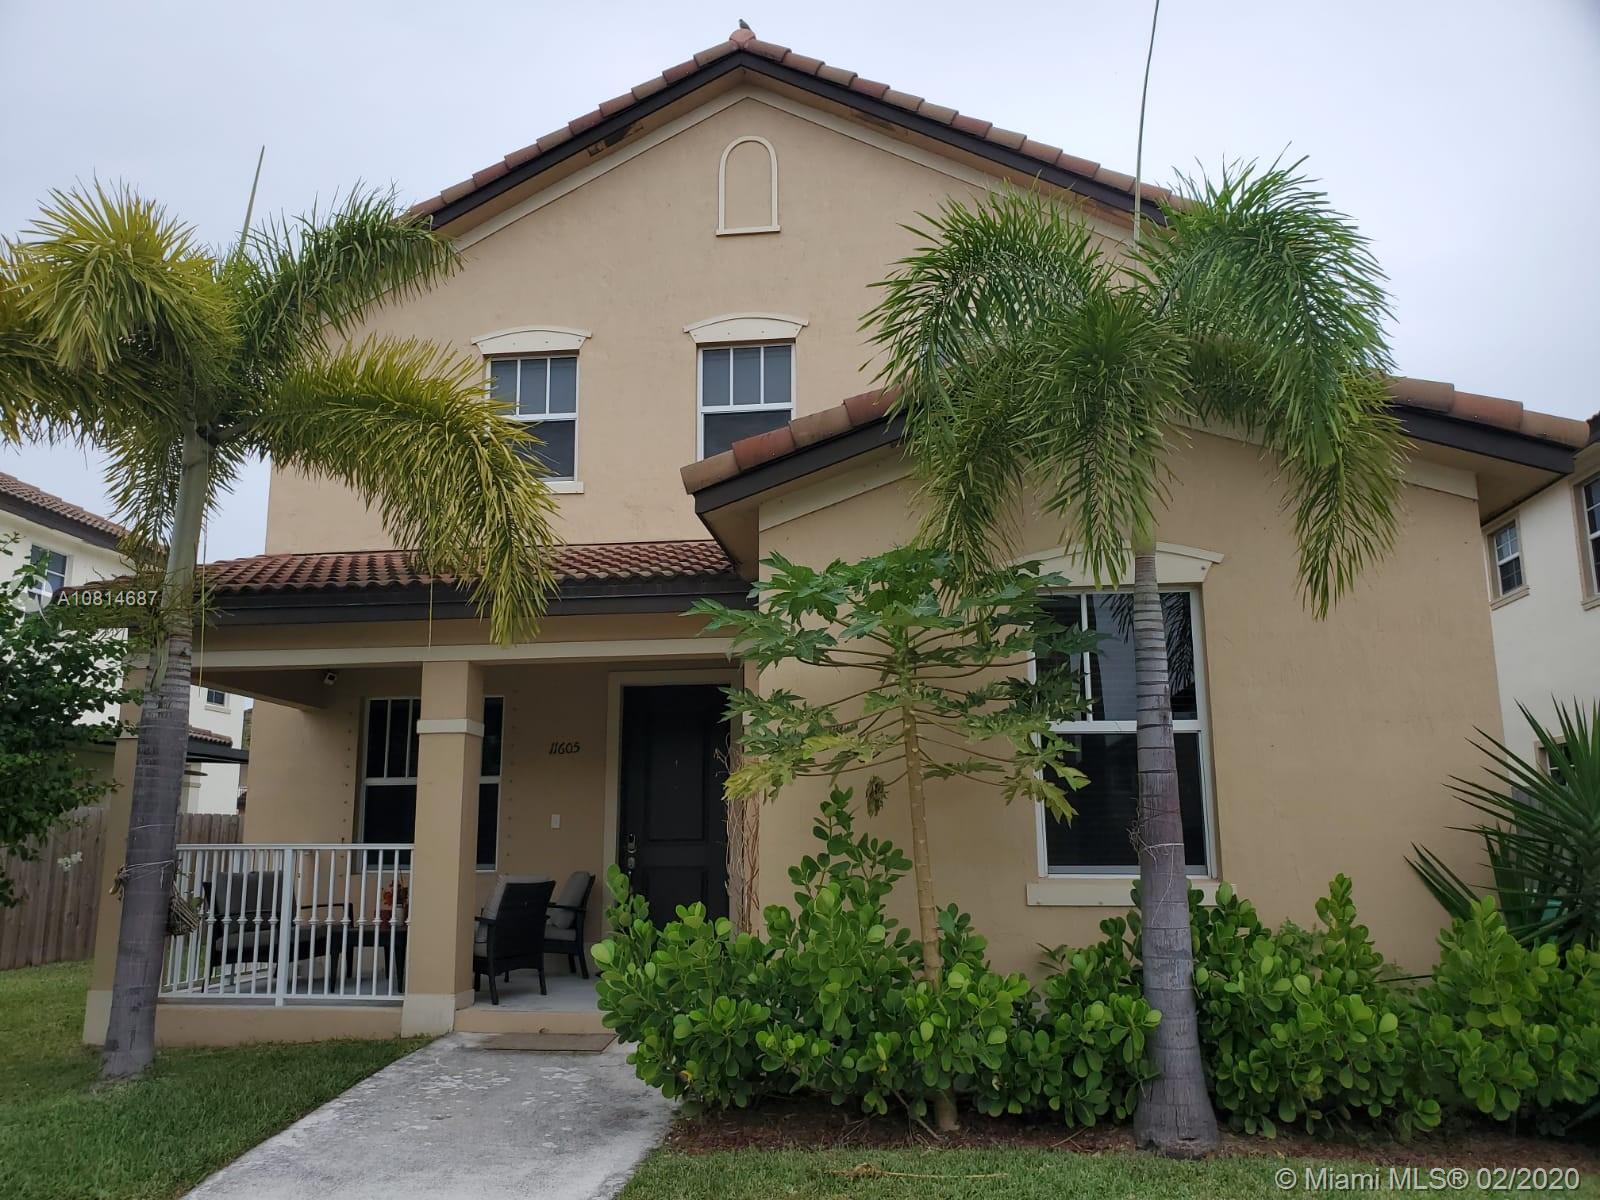 11605 SW 245th Ter, Homestead, FL 33032 - Homestead, FL real estate listing